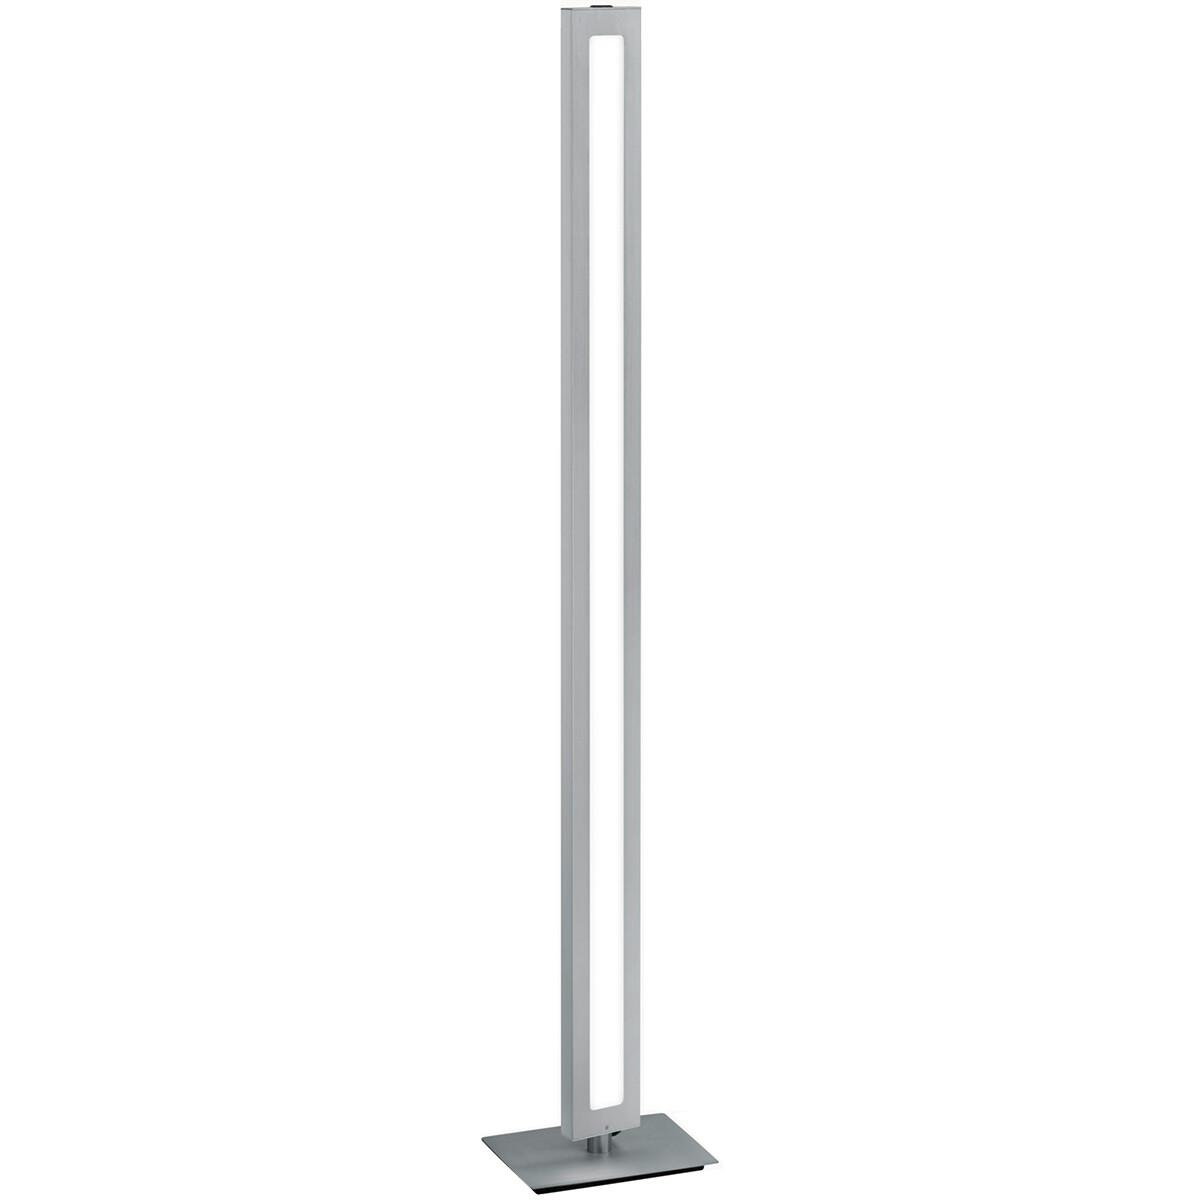 LED Vloerlamp - Trion Sinas - 20W - Warm Wit 3000K - Dimbaar - Rechthoek - Mat Grijs - Aluminium